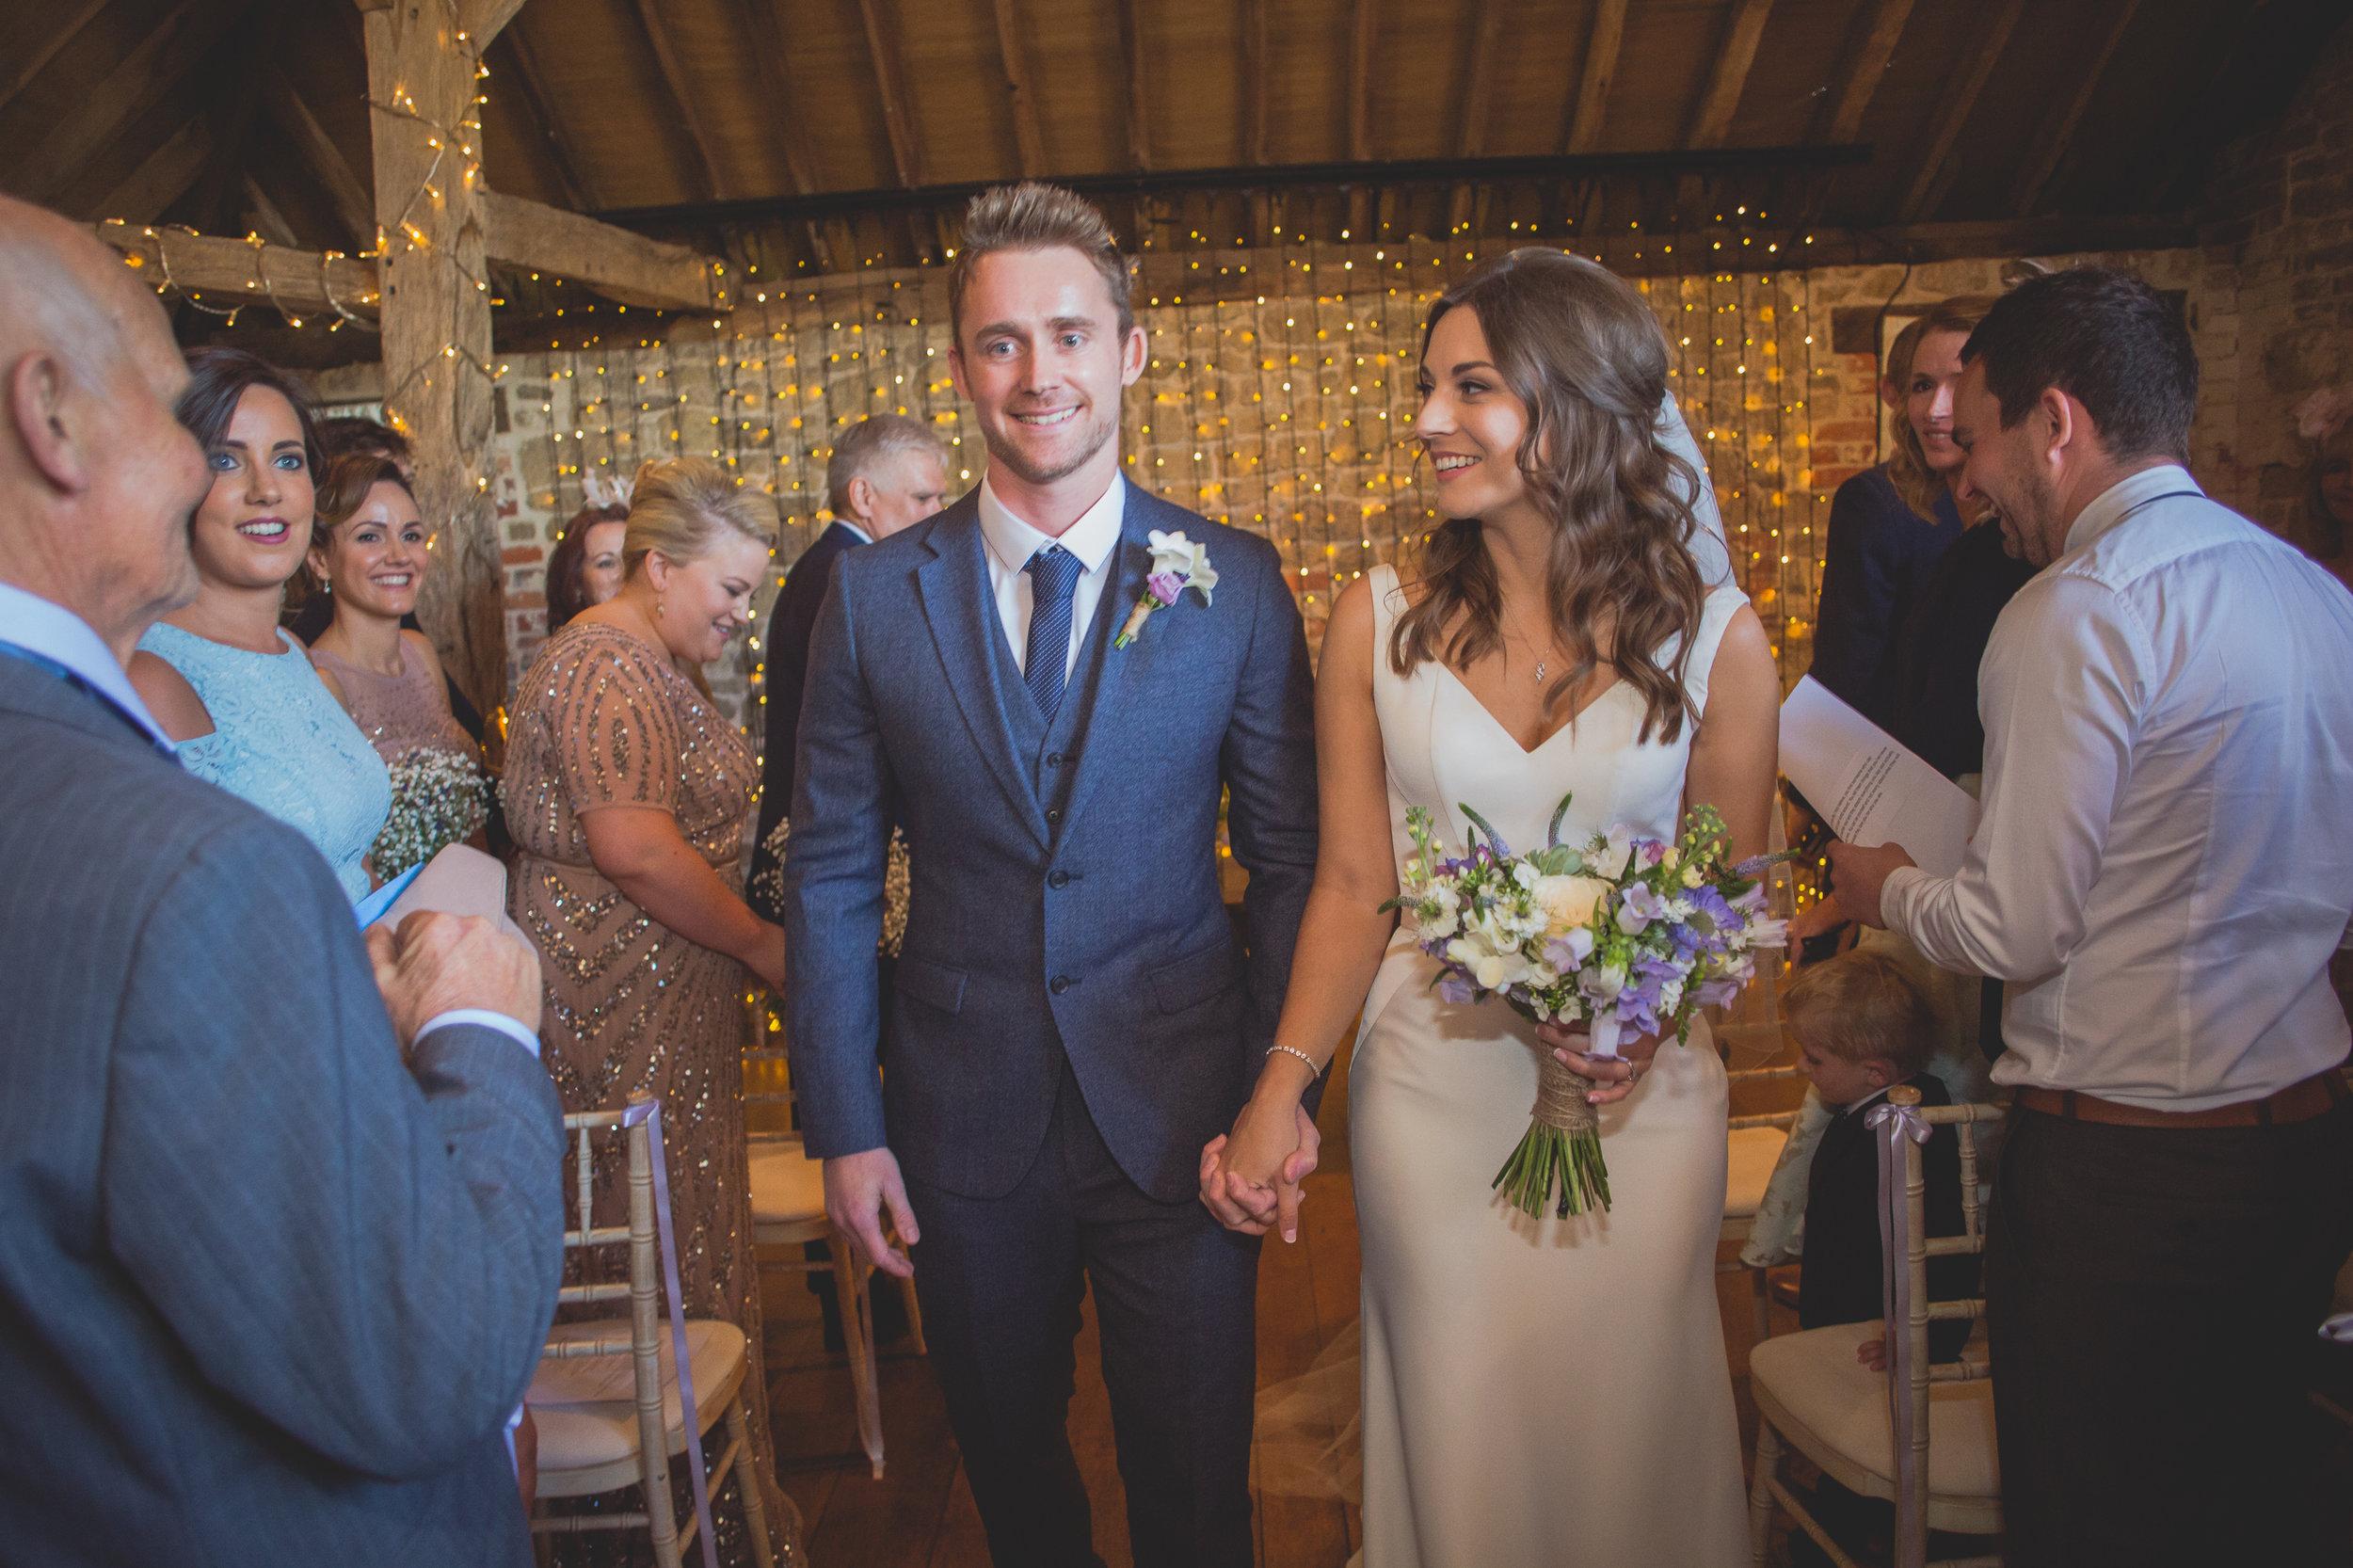 Grittenham Barn female wedding photographers west sussex petworth social-71.jpg